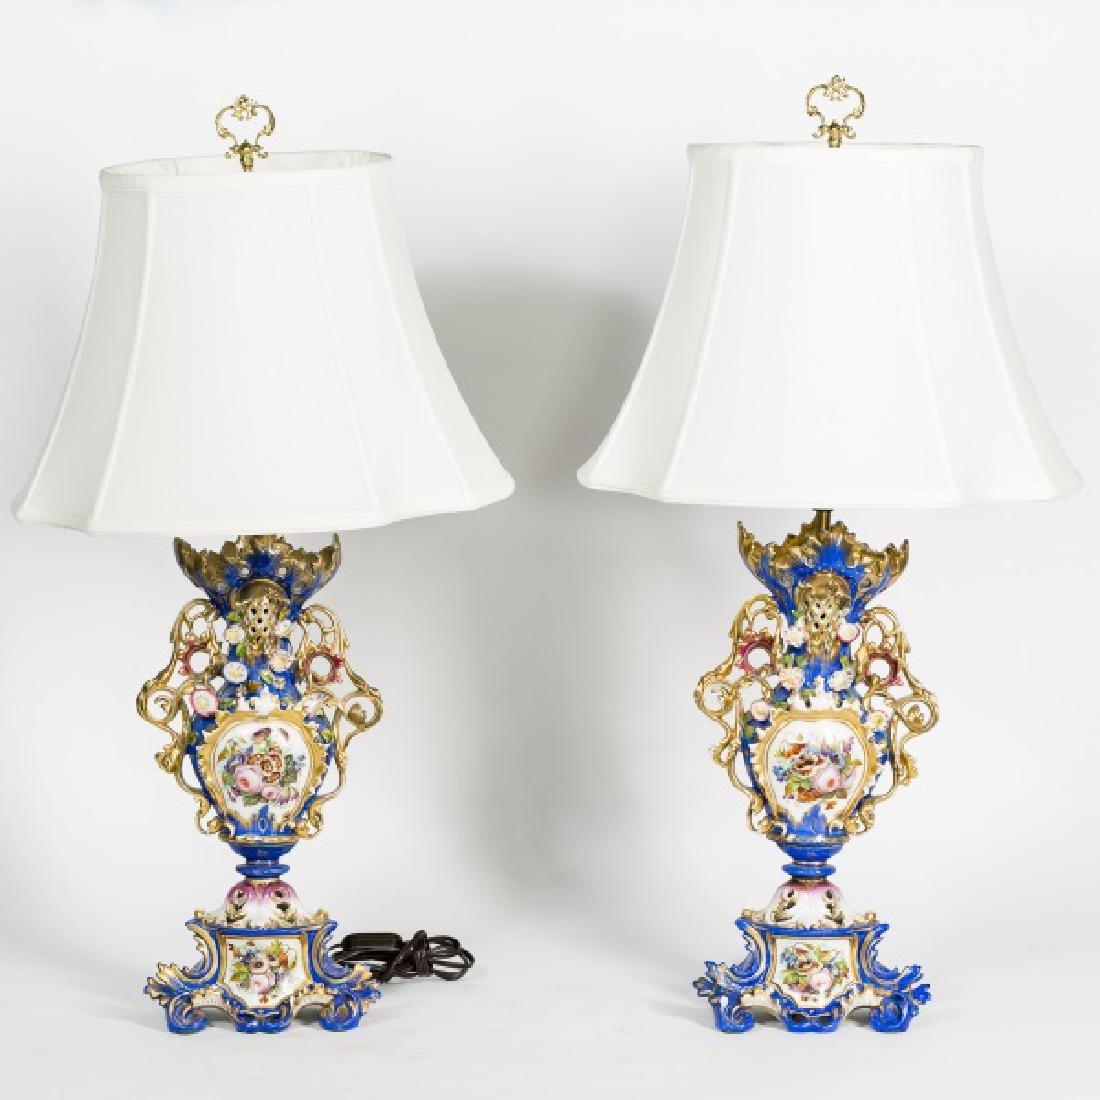 Pair of Blue Porcelain Urn Floral Table Lamps